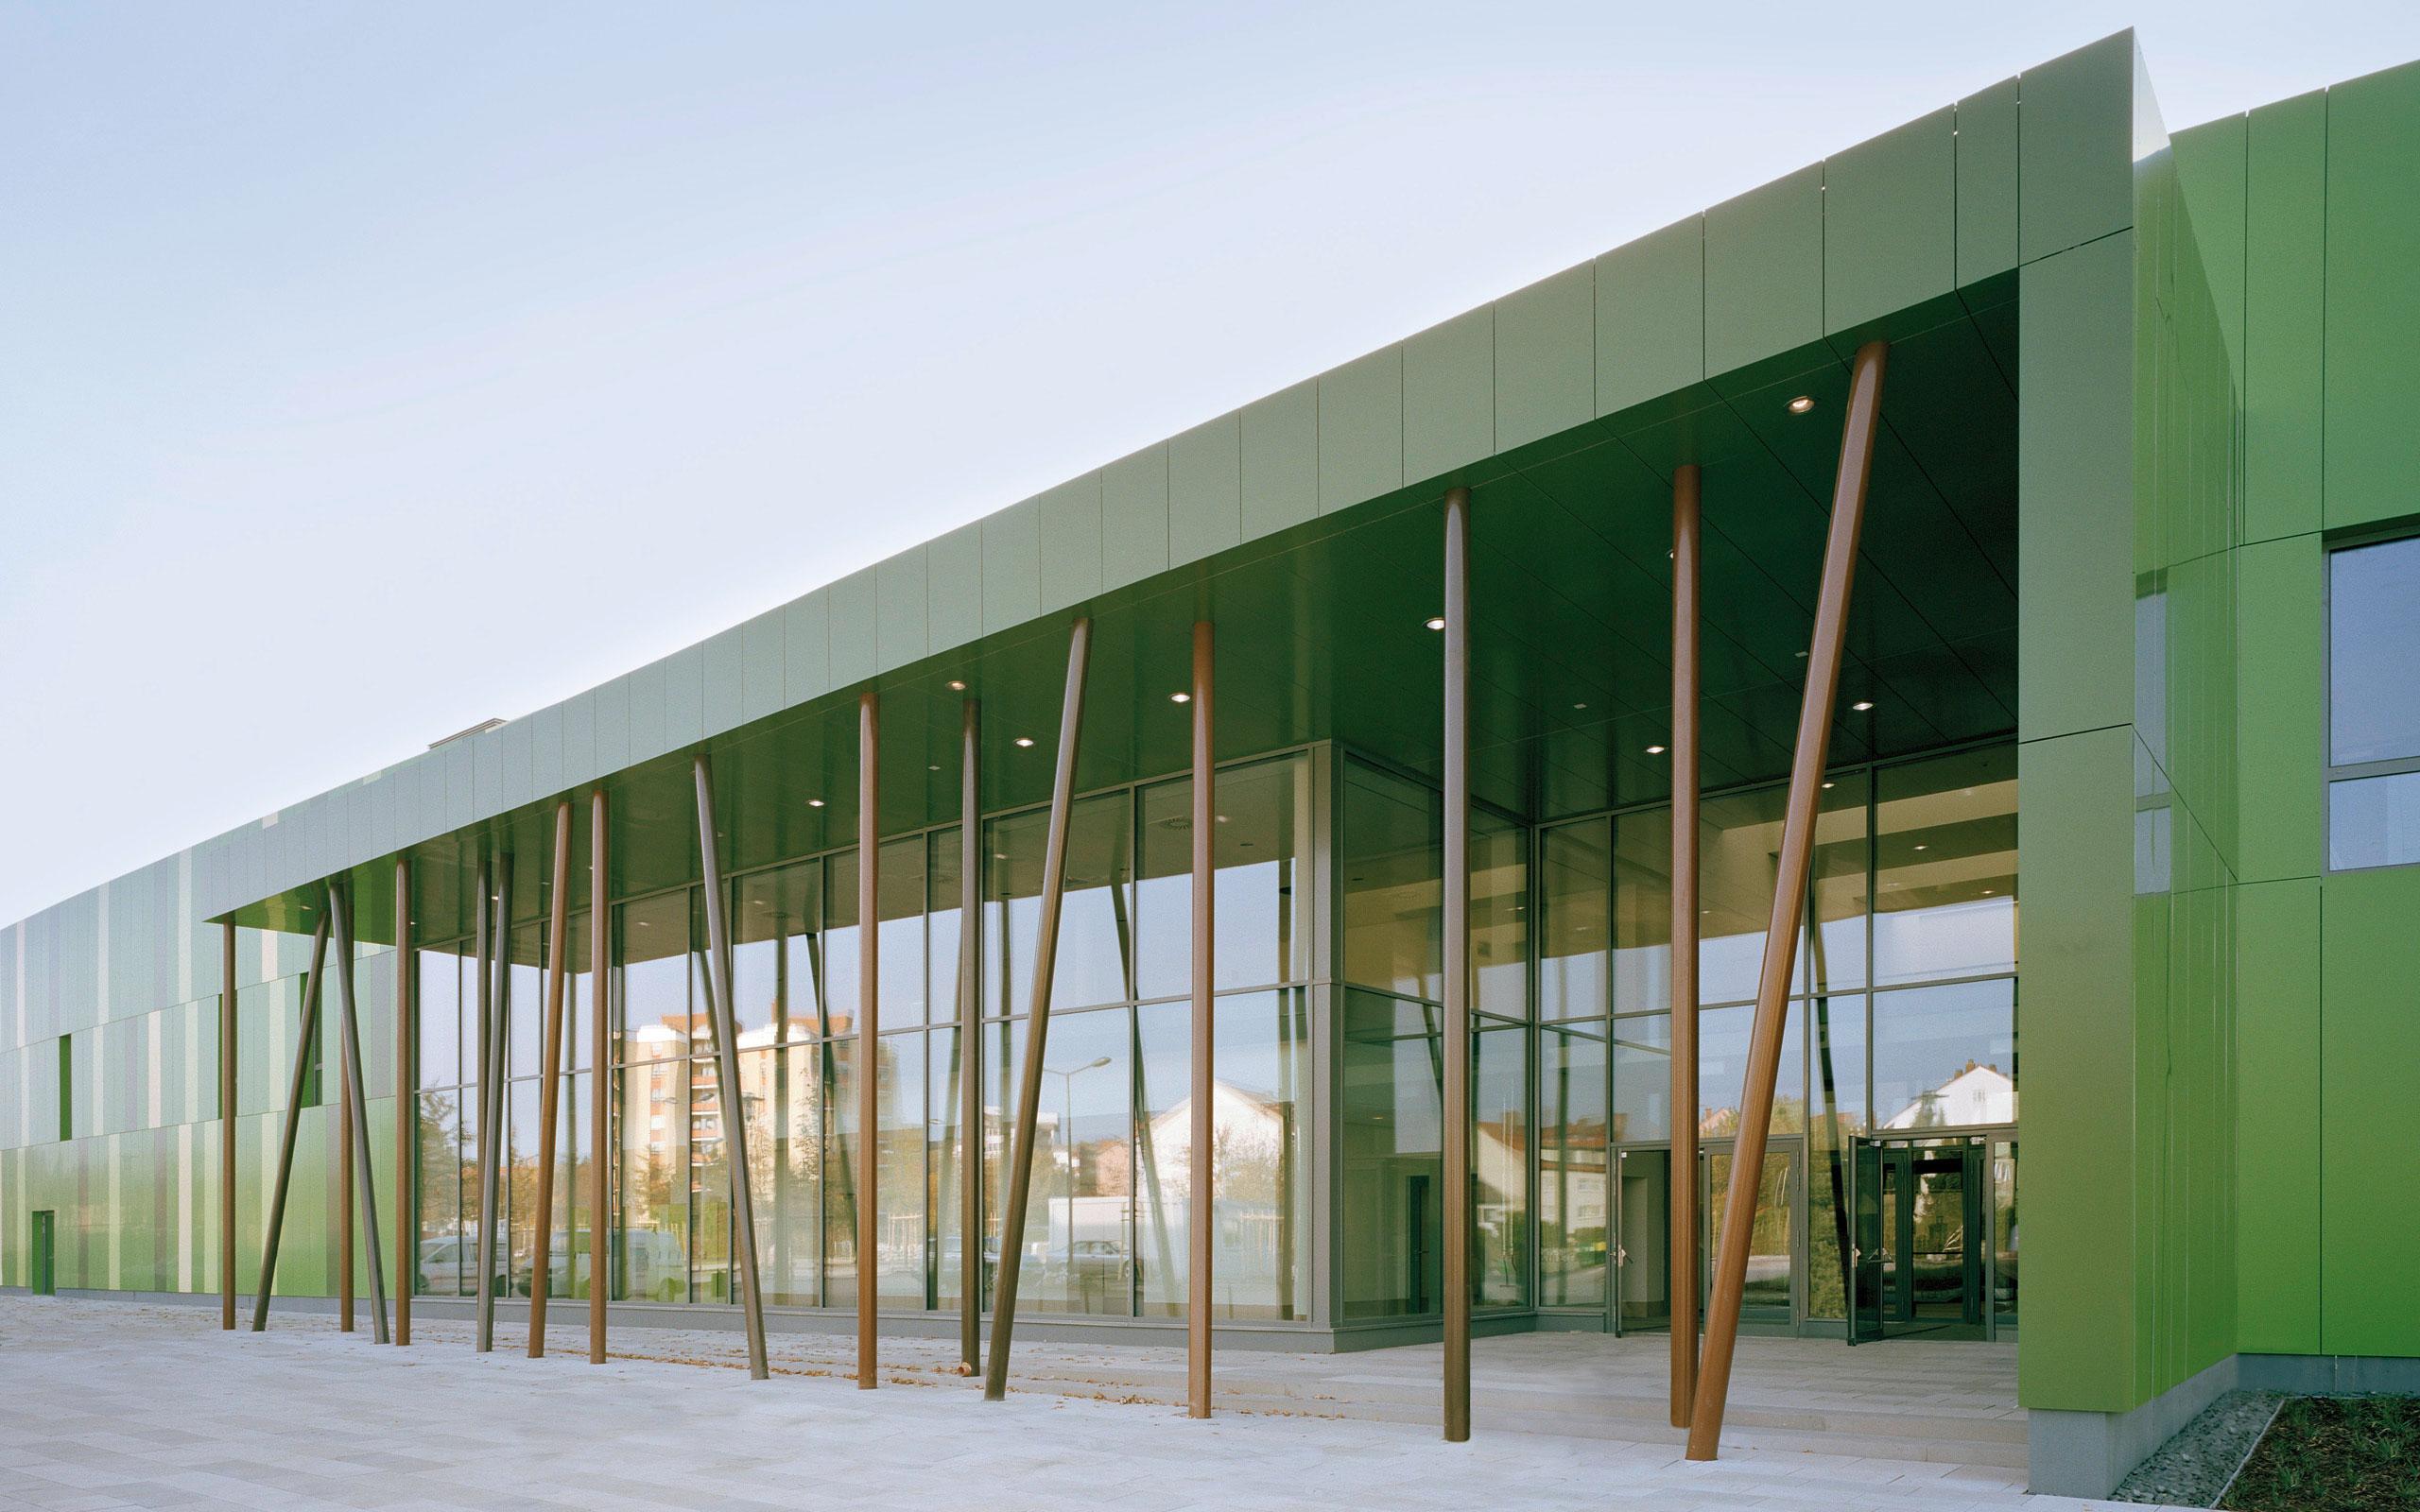 Bambados bamberg - Schwimmbad architektur ...